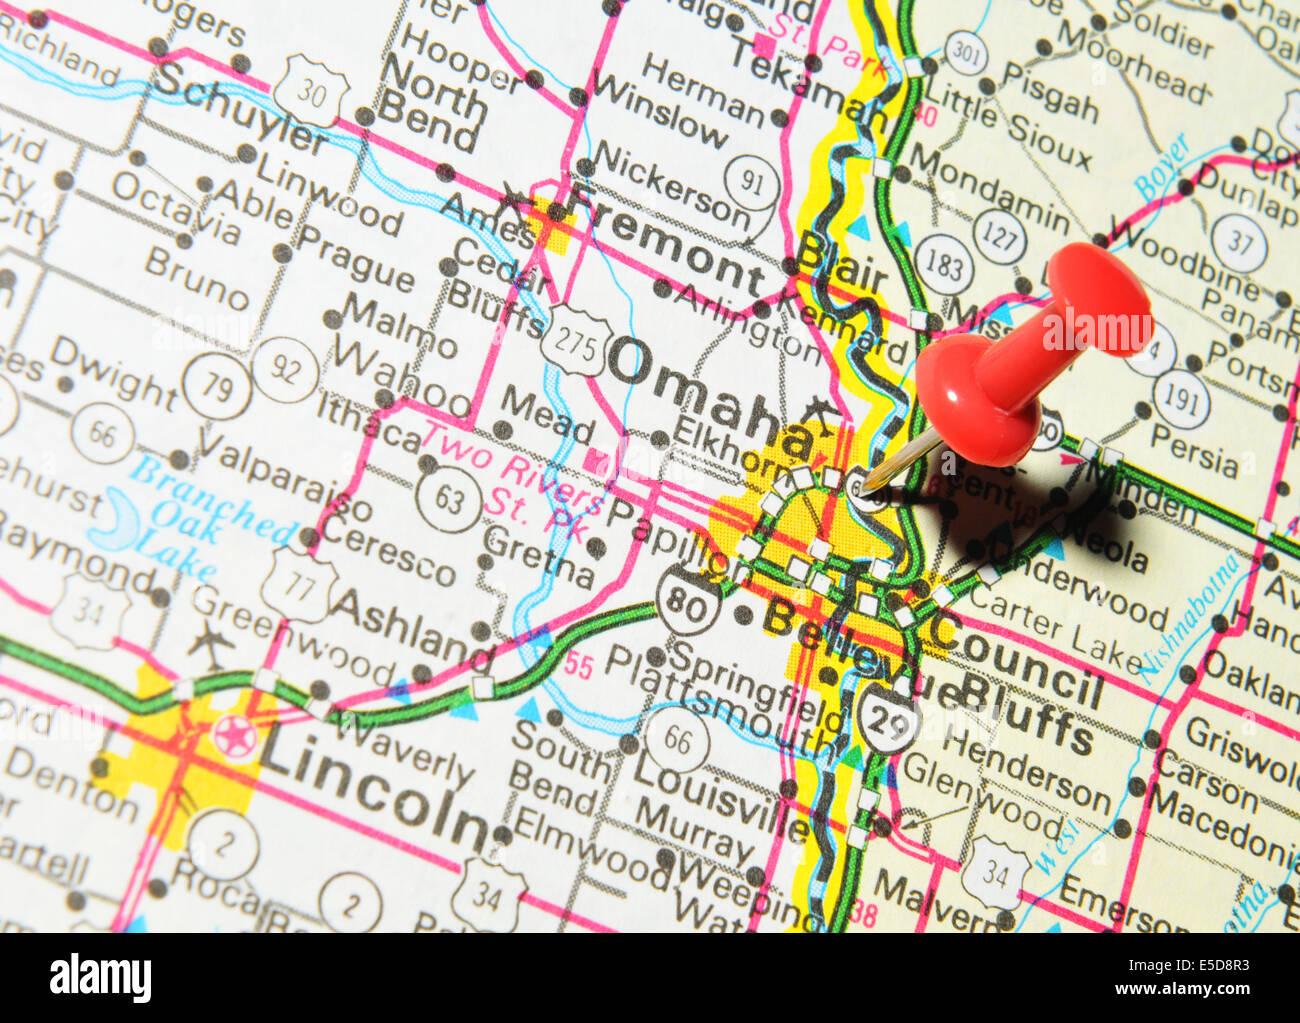 Omaha On US Map Stock Photo Royalty Free Image Alamy - Omaha us map